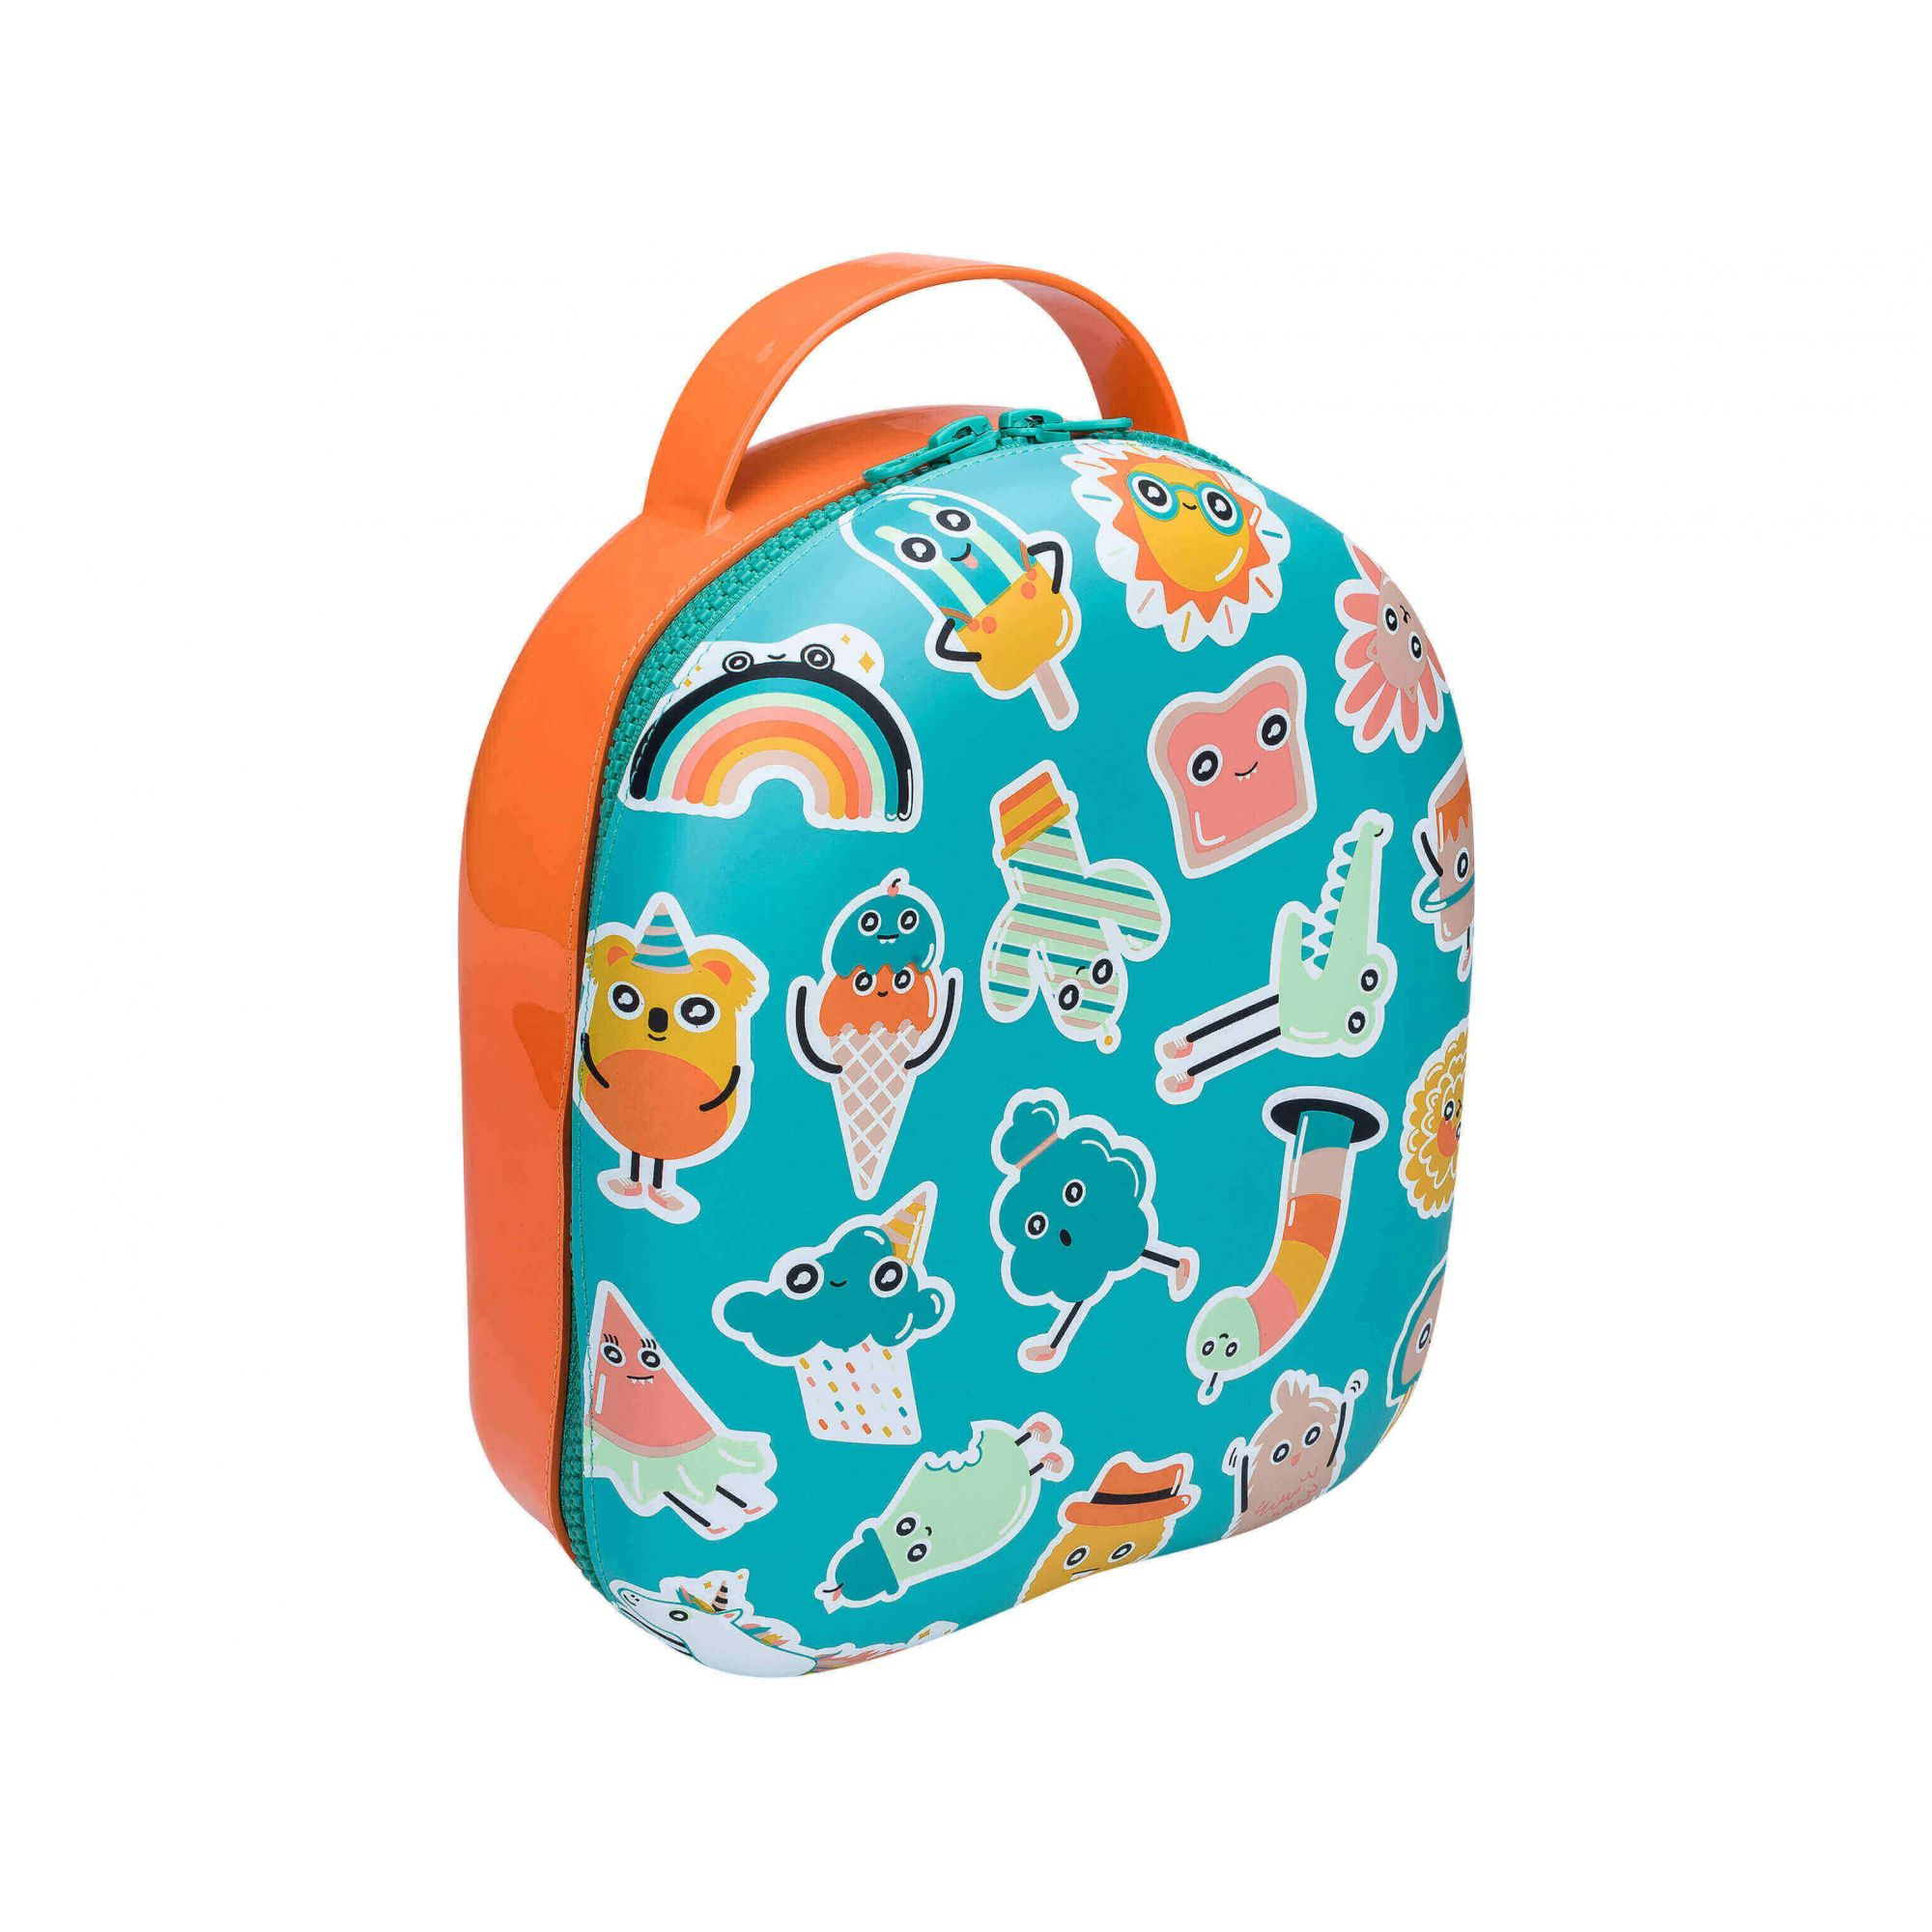 Mini Bag + Turma do Pudim  - Choque Concept